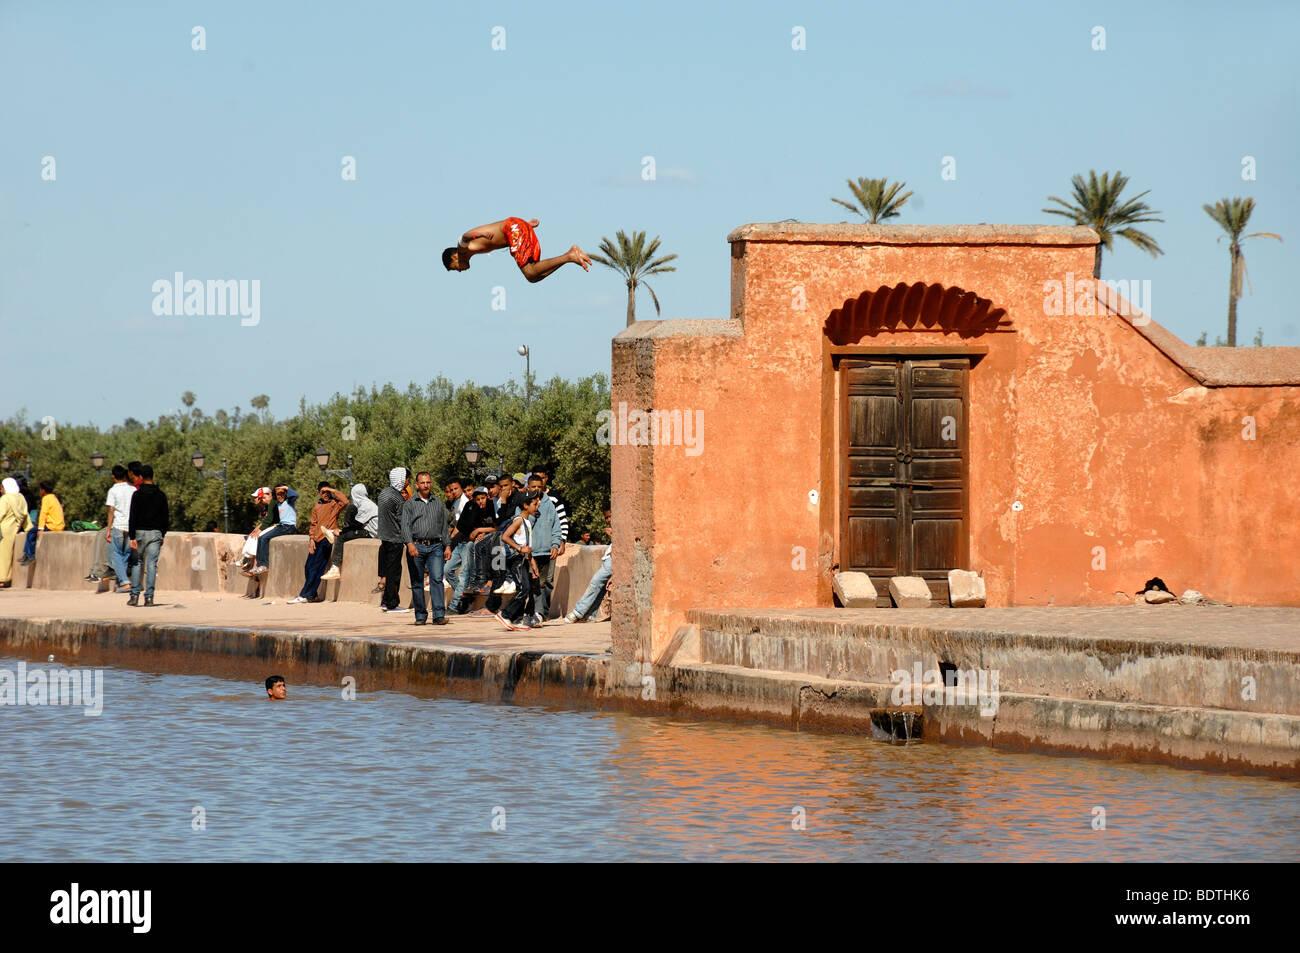 Boys Dive Off the Walls of the Menara Royal Pavilion into the Lake or Pool of the Menara Gardens Marrakesh Morocco - Stock Image